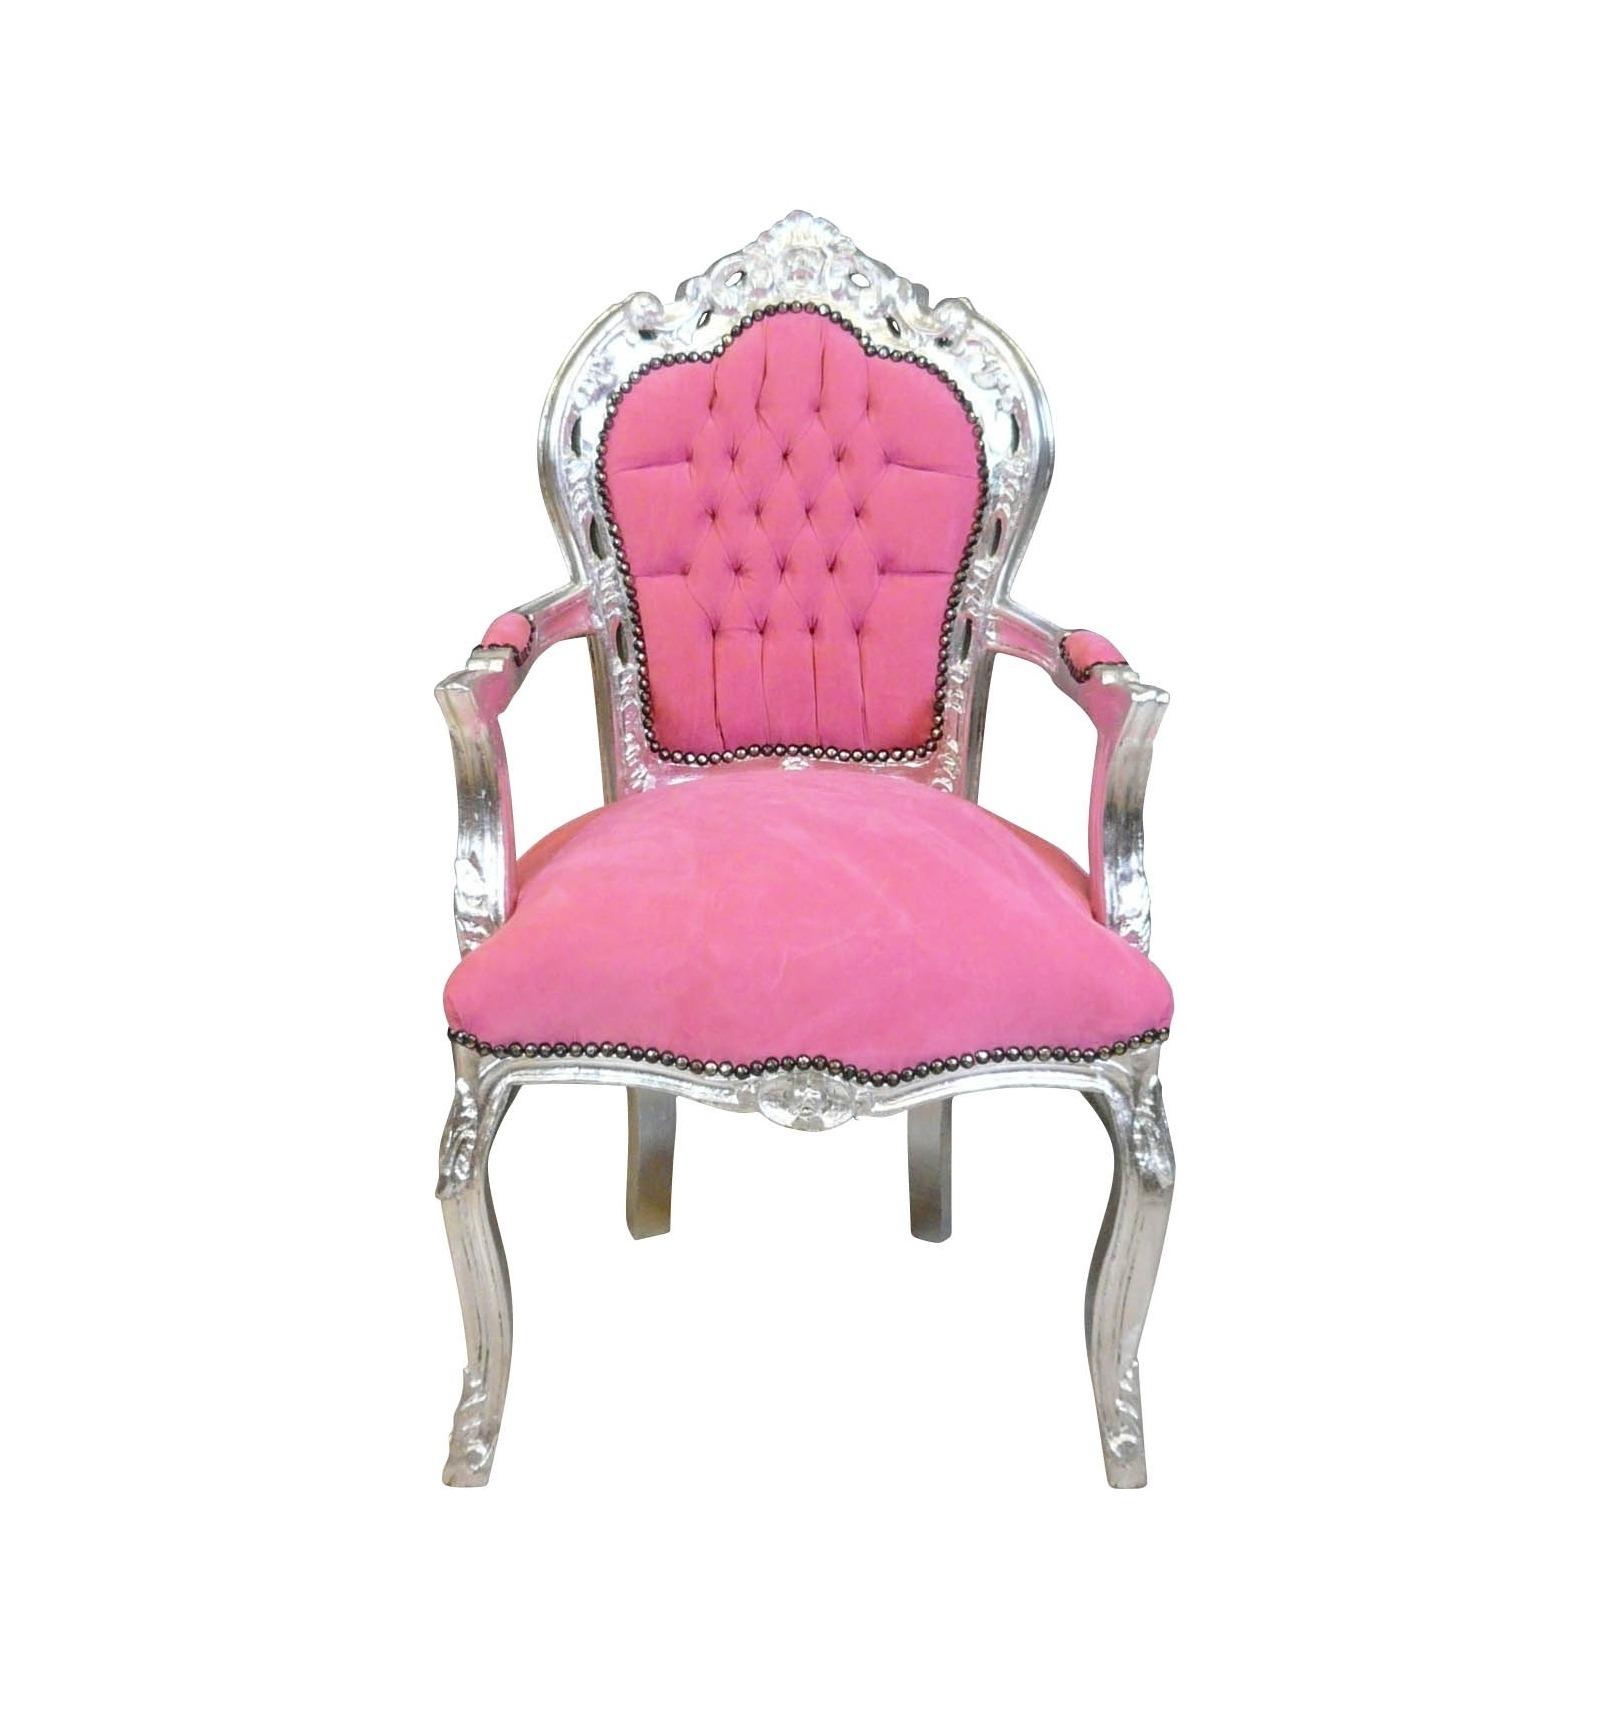 poltrona barocco barrocco. Black Bedroom Furniture Sets. Home Design Ideas